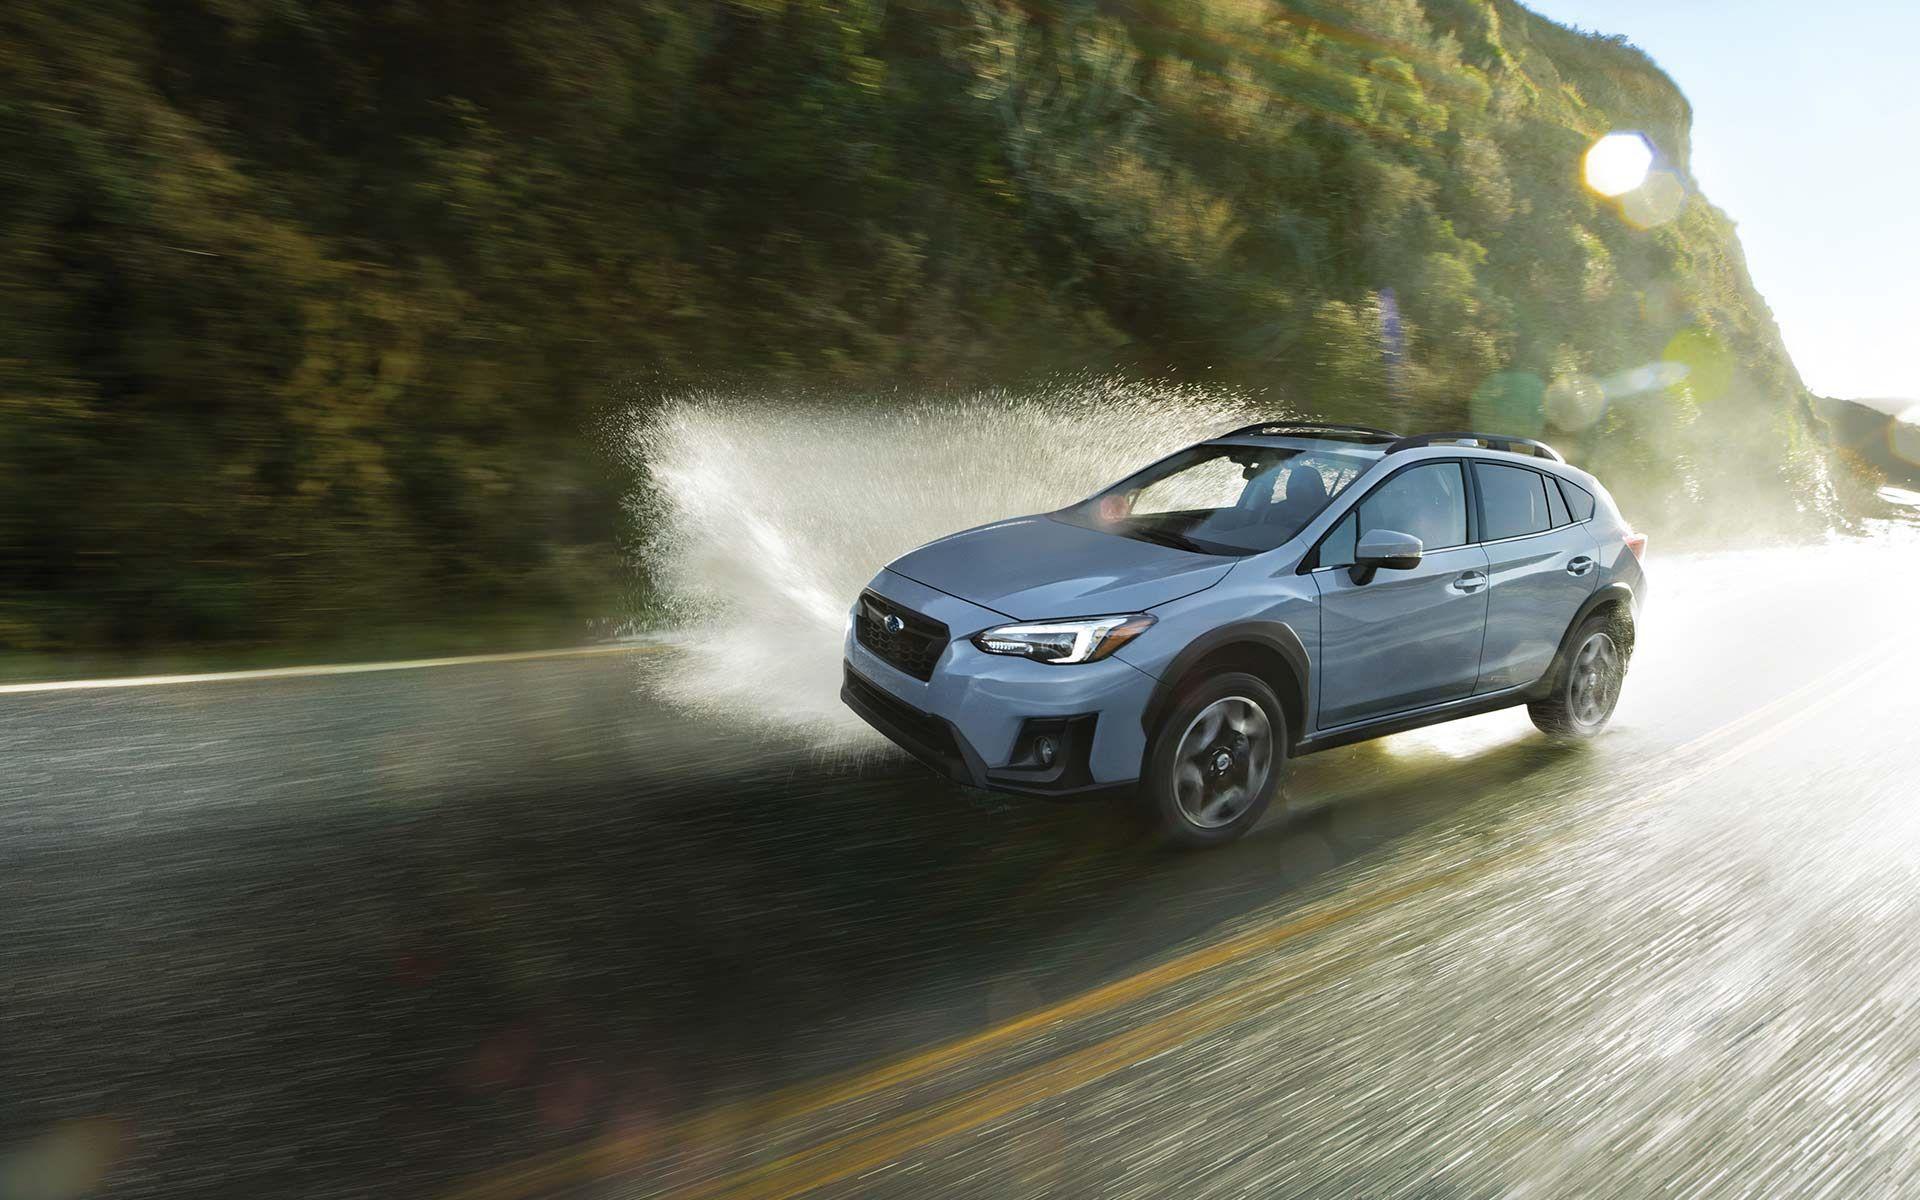 The Best Subaru Xv 2019 Interior Performance And New Engine